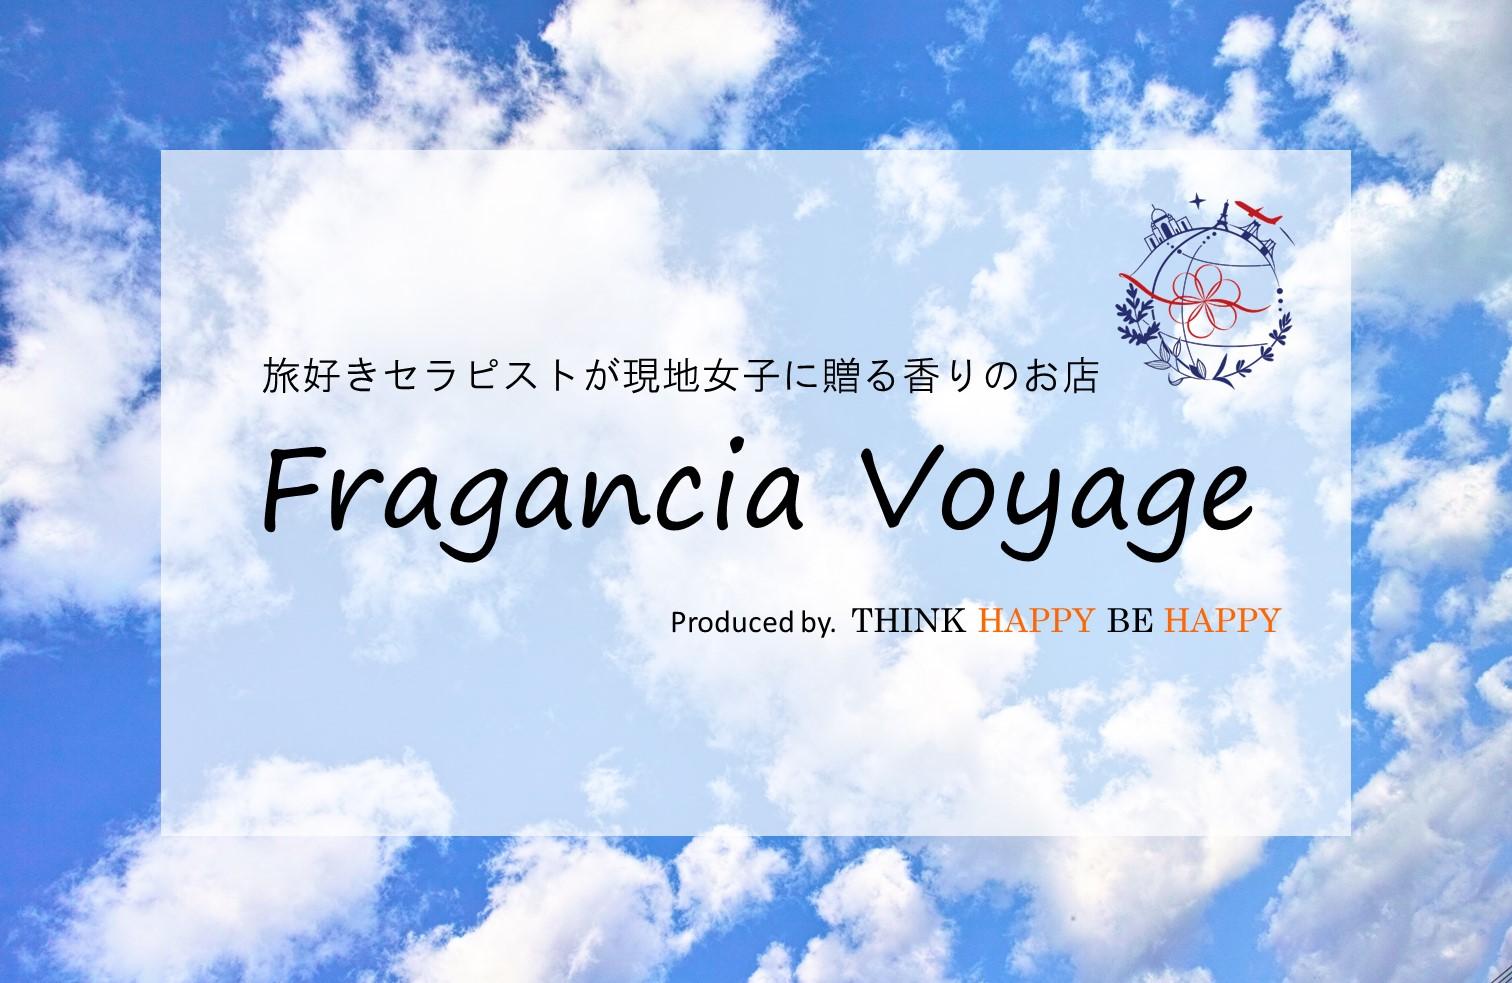 Fragancia Voyage